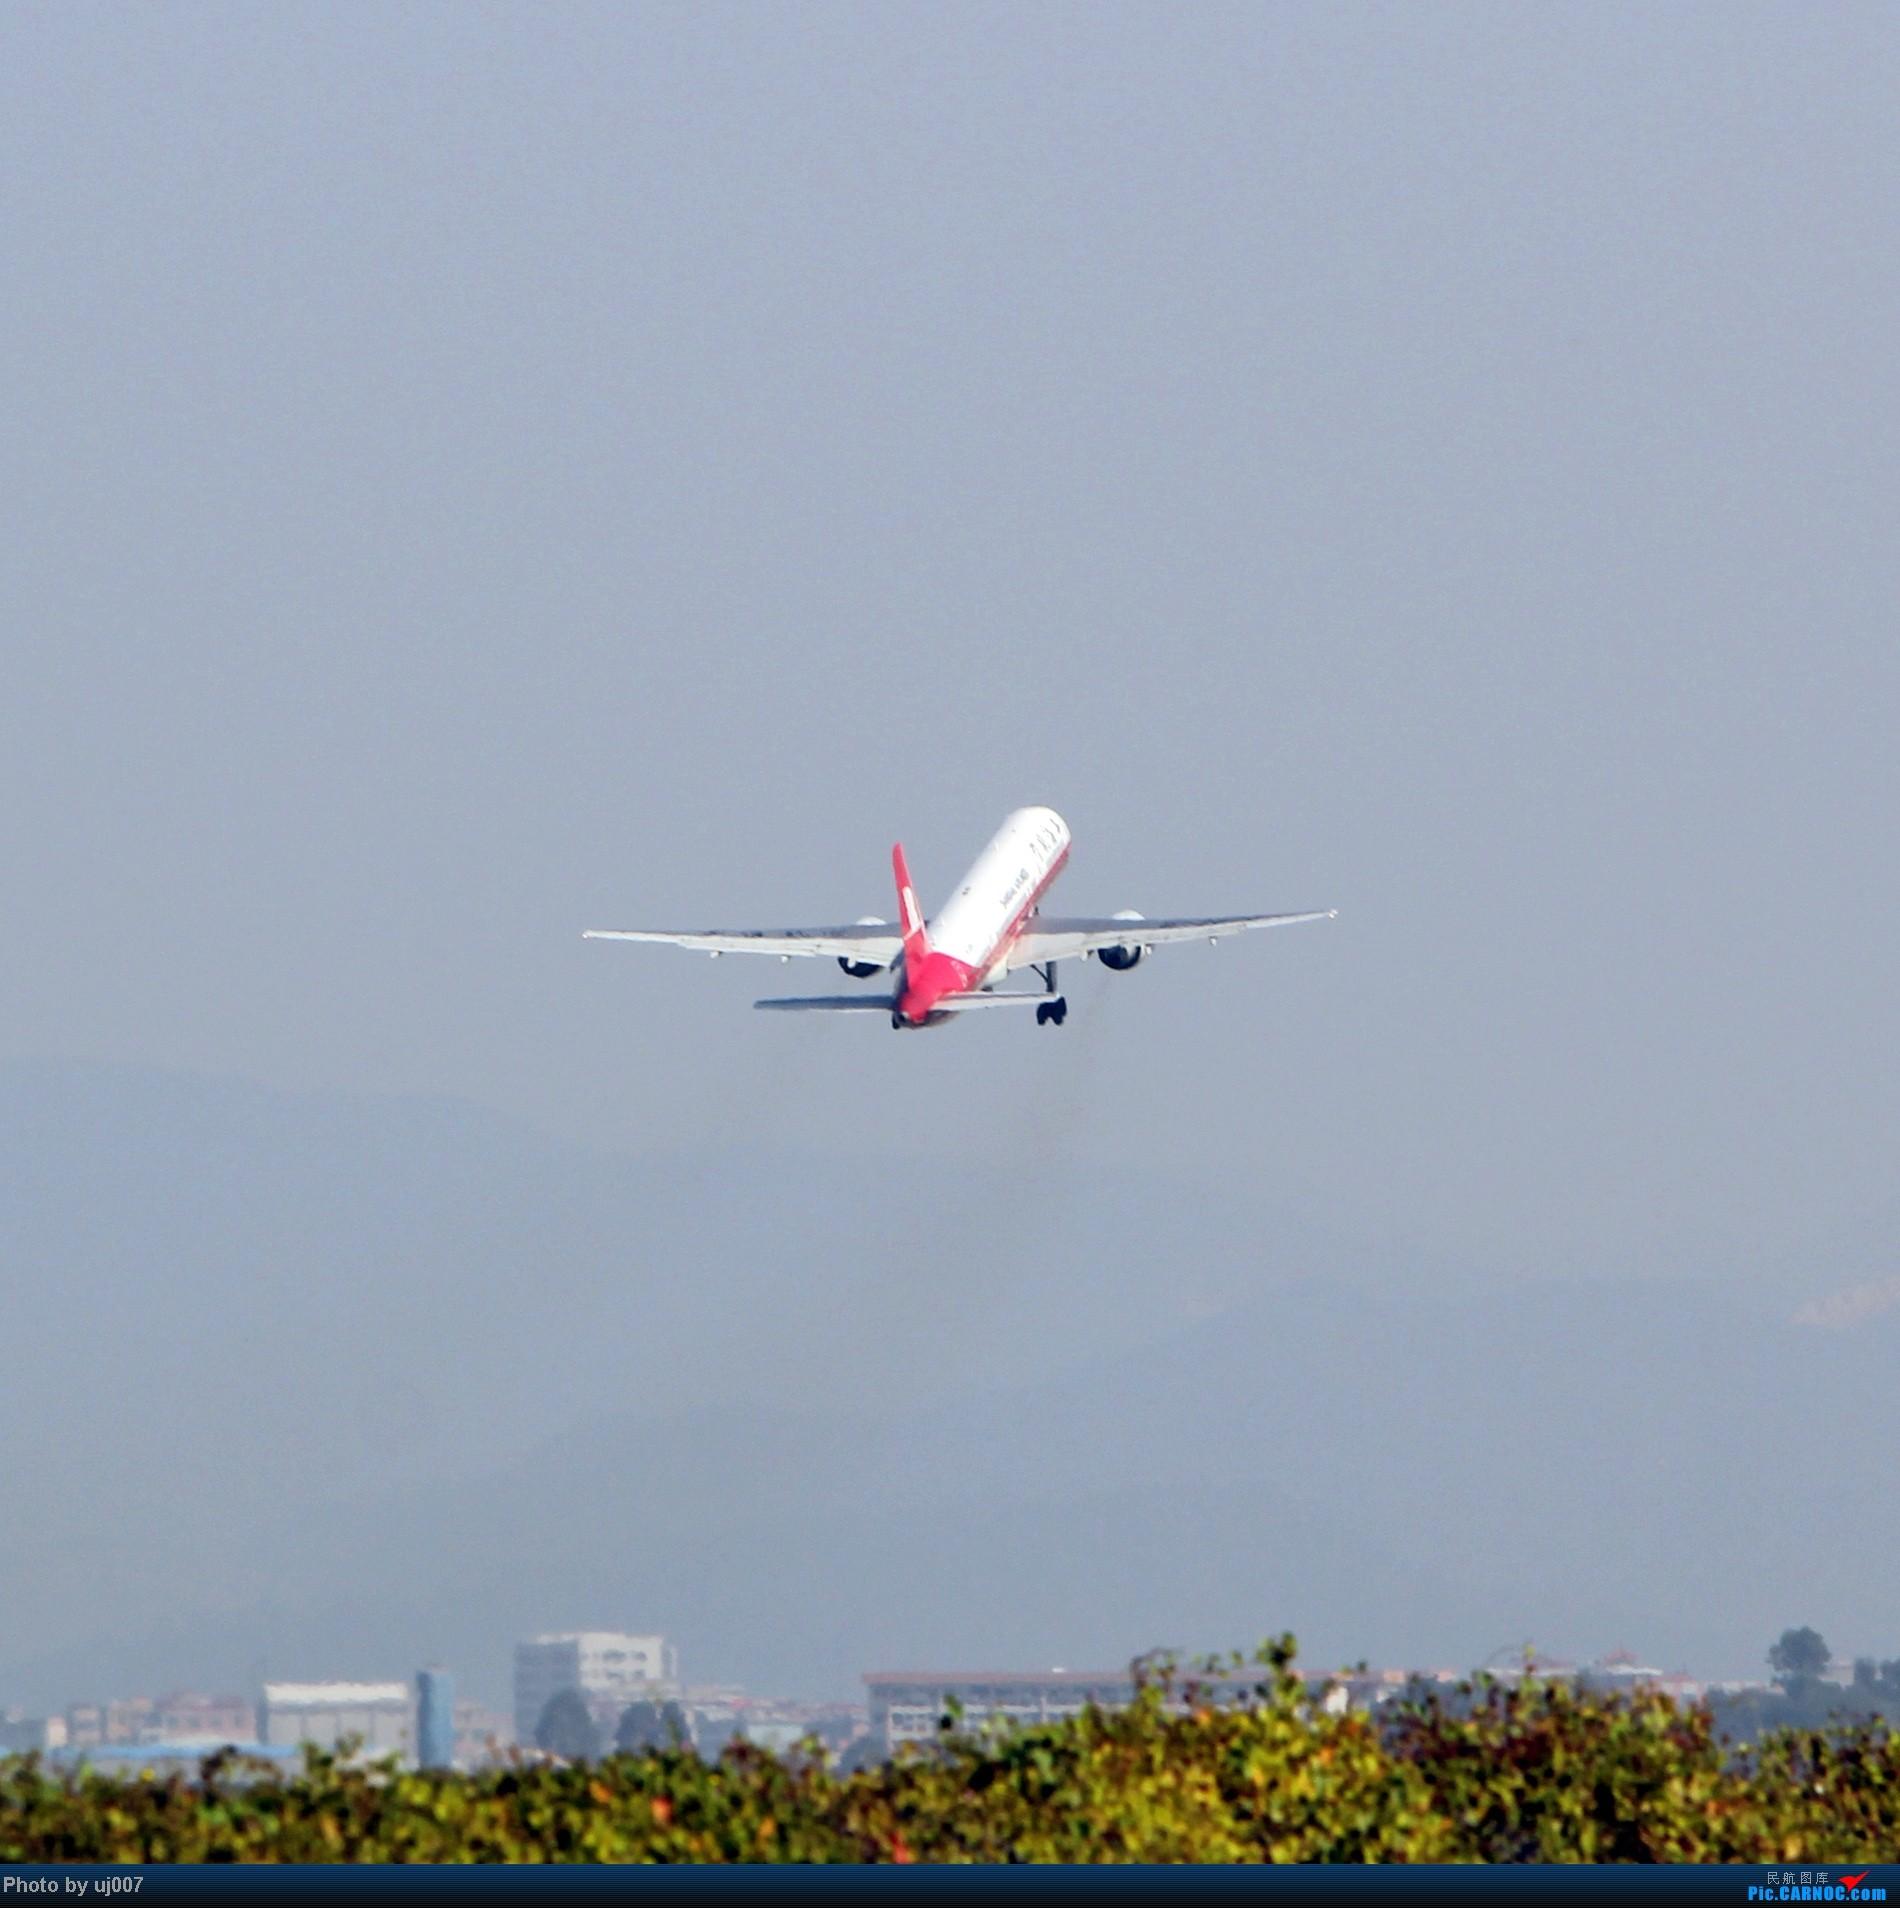 Re:[原创]10月2日白云拍机(大飞机,特别妆,外航,闪灯,擦烟)求指点. BOEING 757-200 B-2876 广州白云国际机场